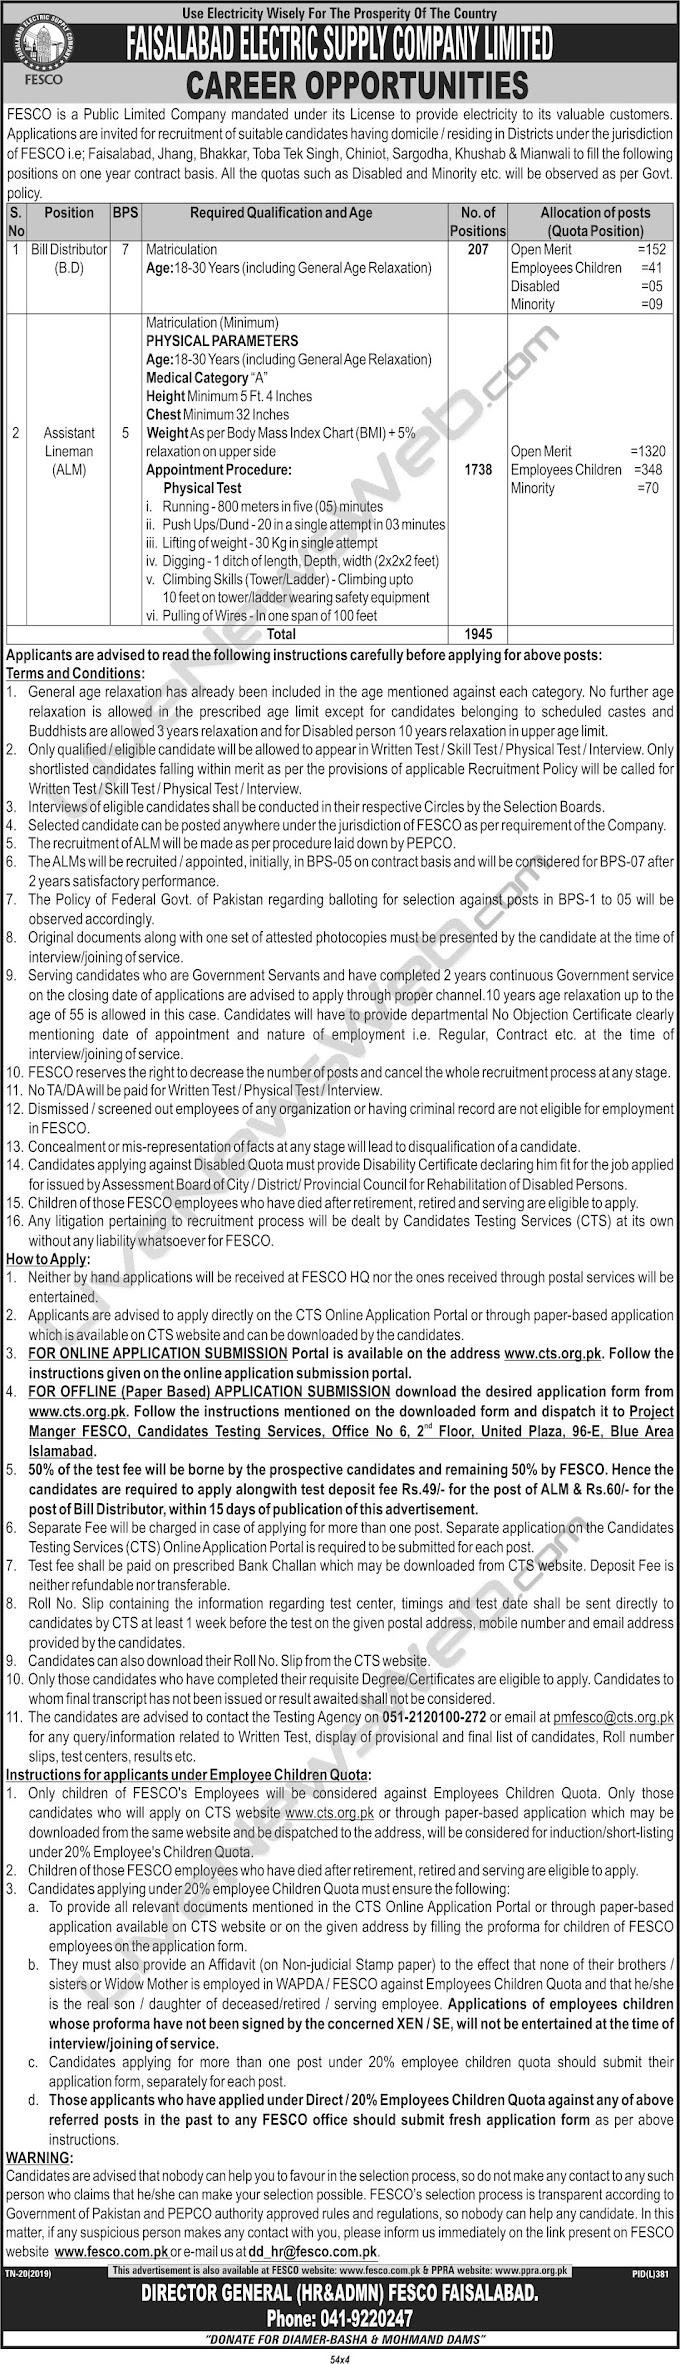 Jobs in FESCO (Faisalabad Electric Supply Company)